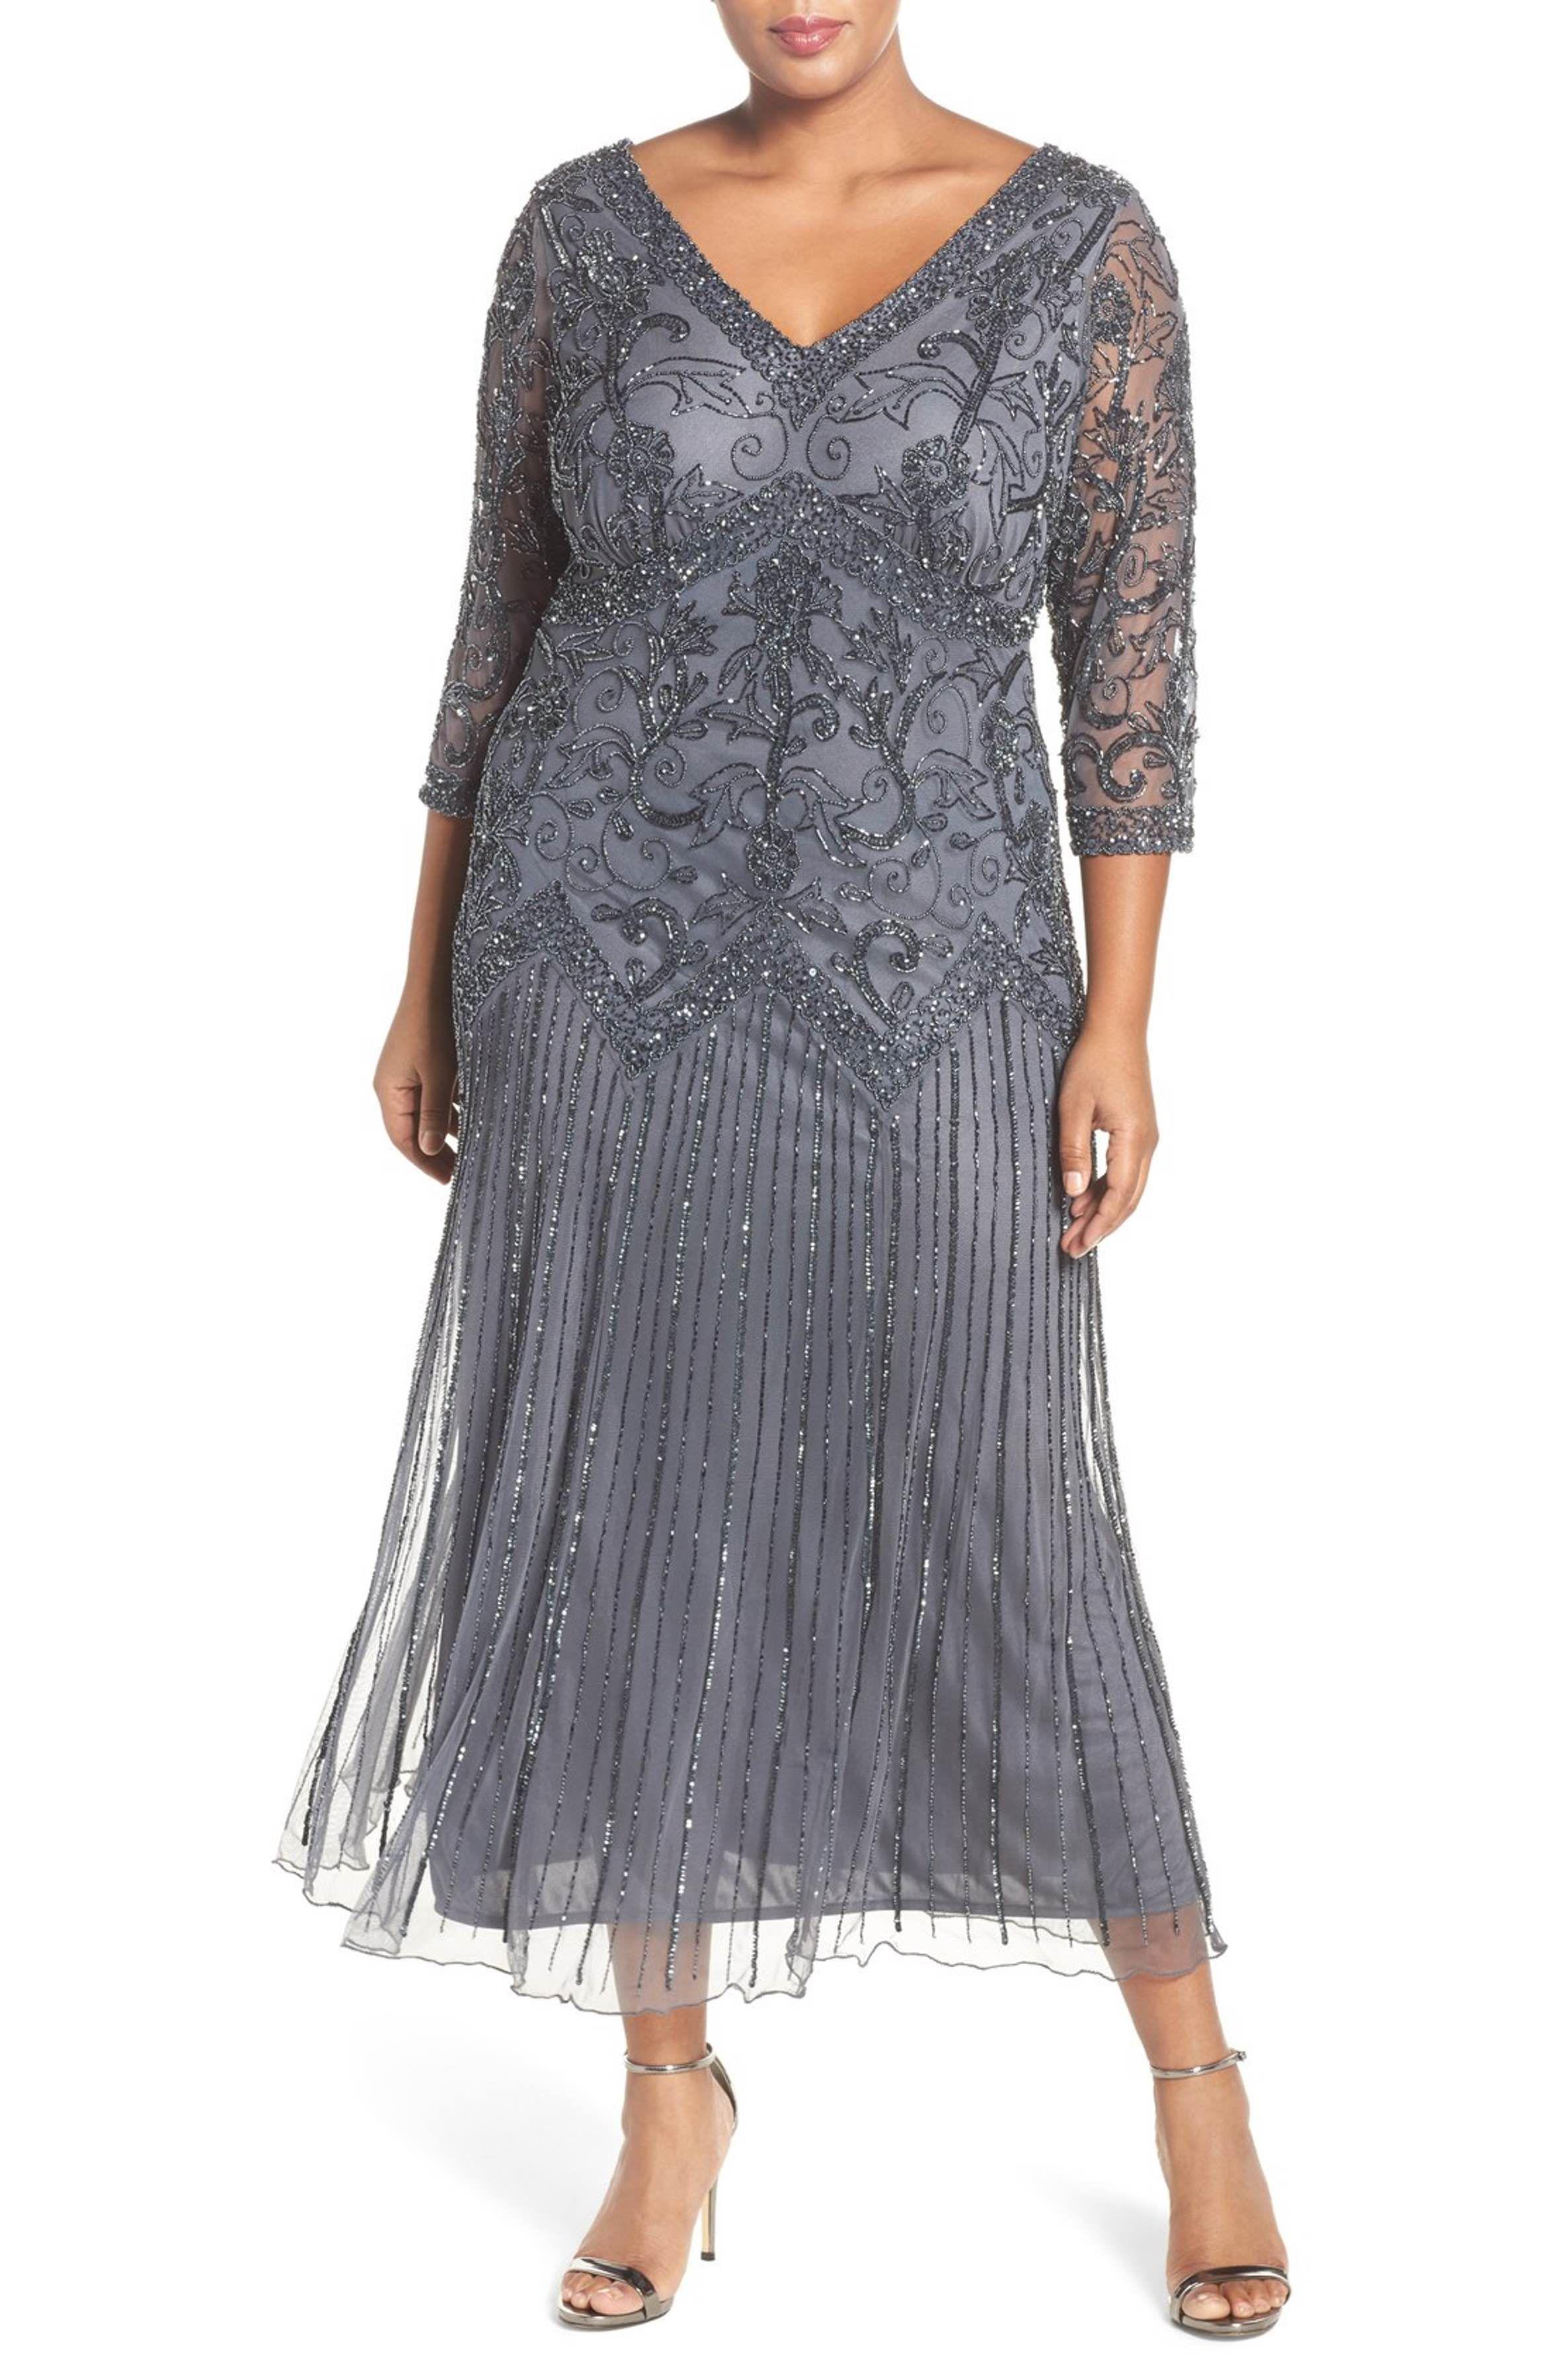 Embellished double vneck midi dress midi dresses and weddings